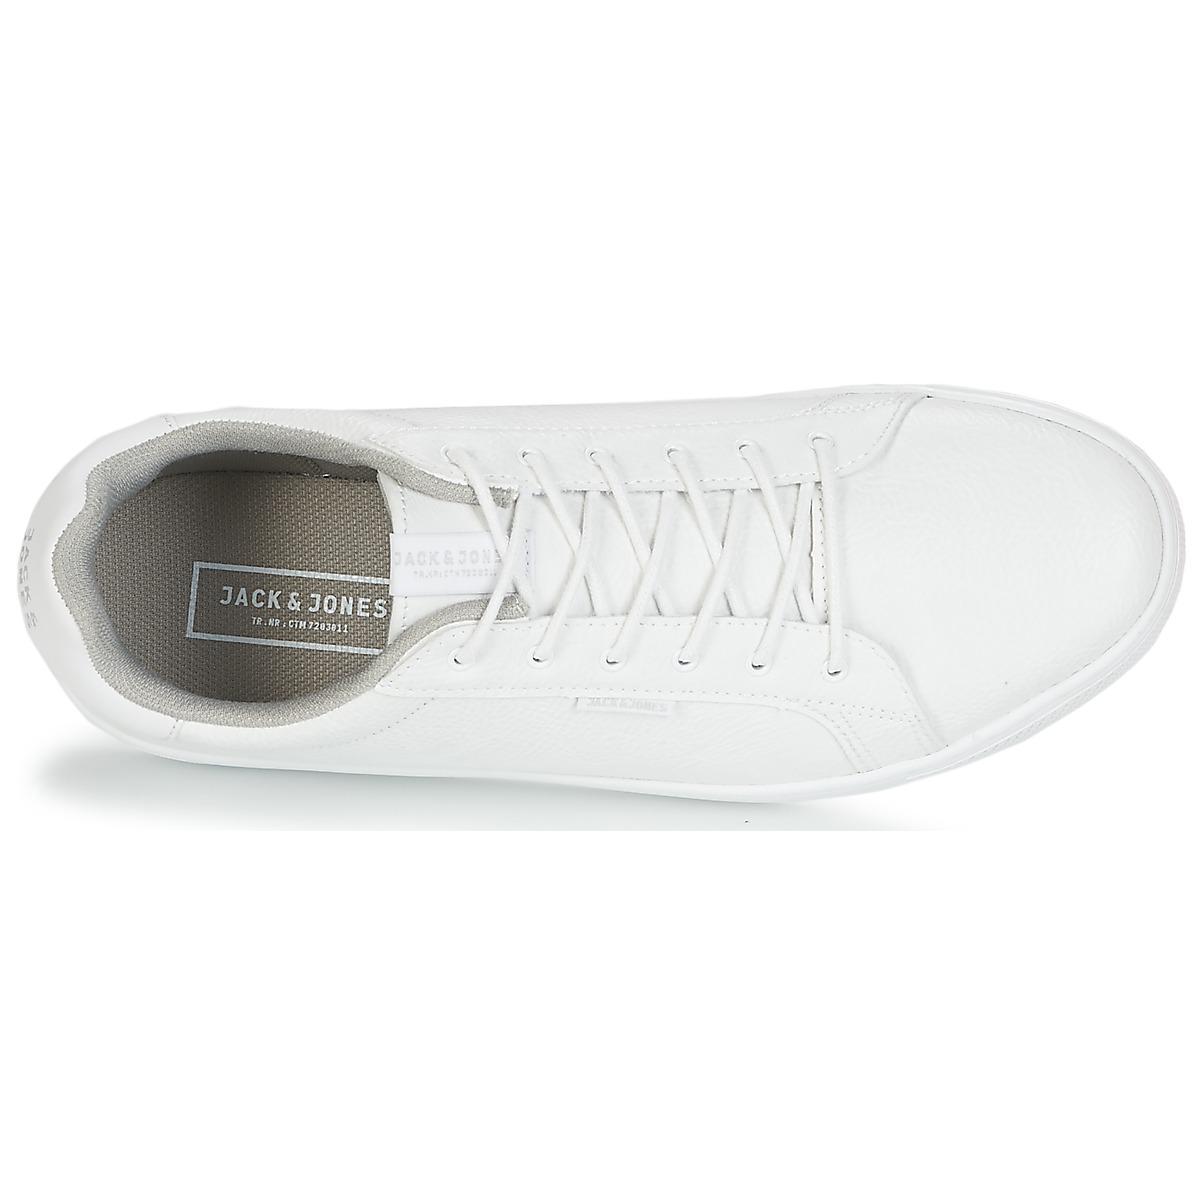 Jack & Jones Trent Men's Shoes (trainers) In White for Men